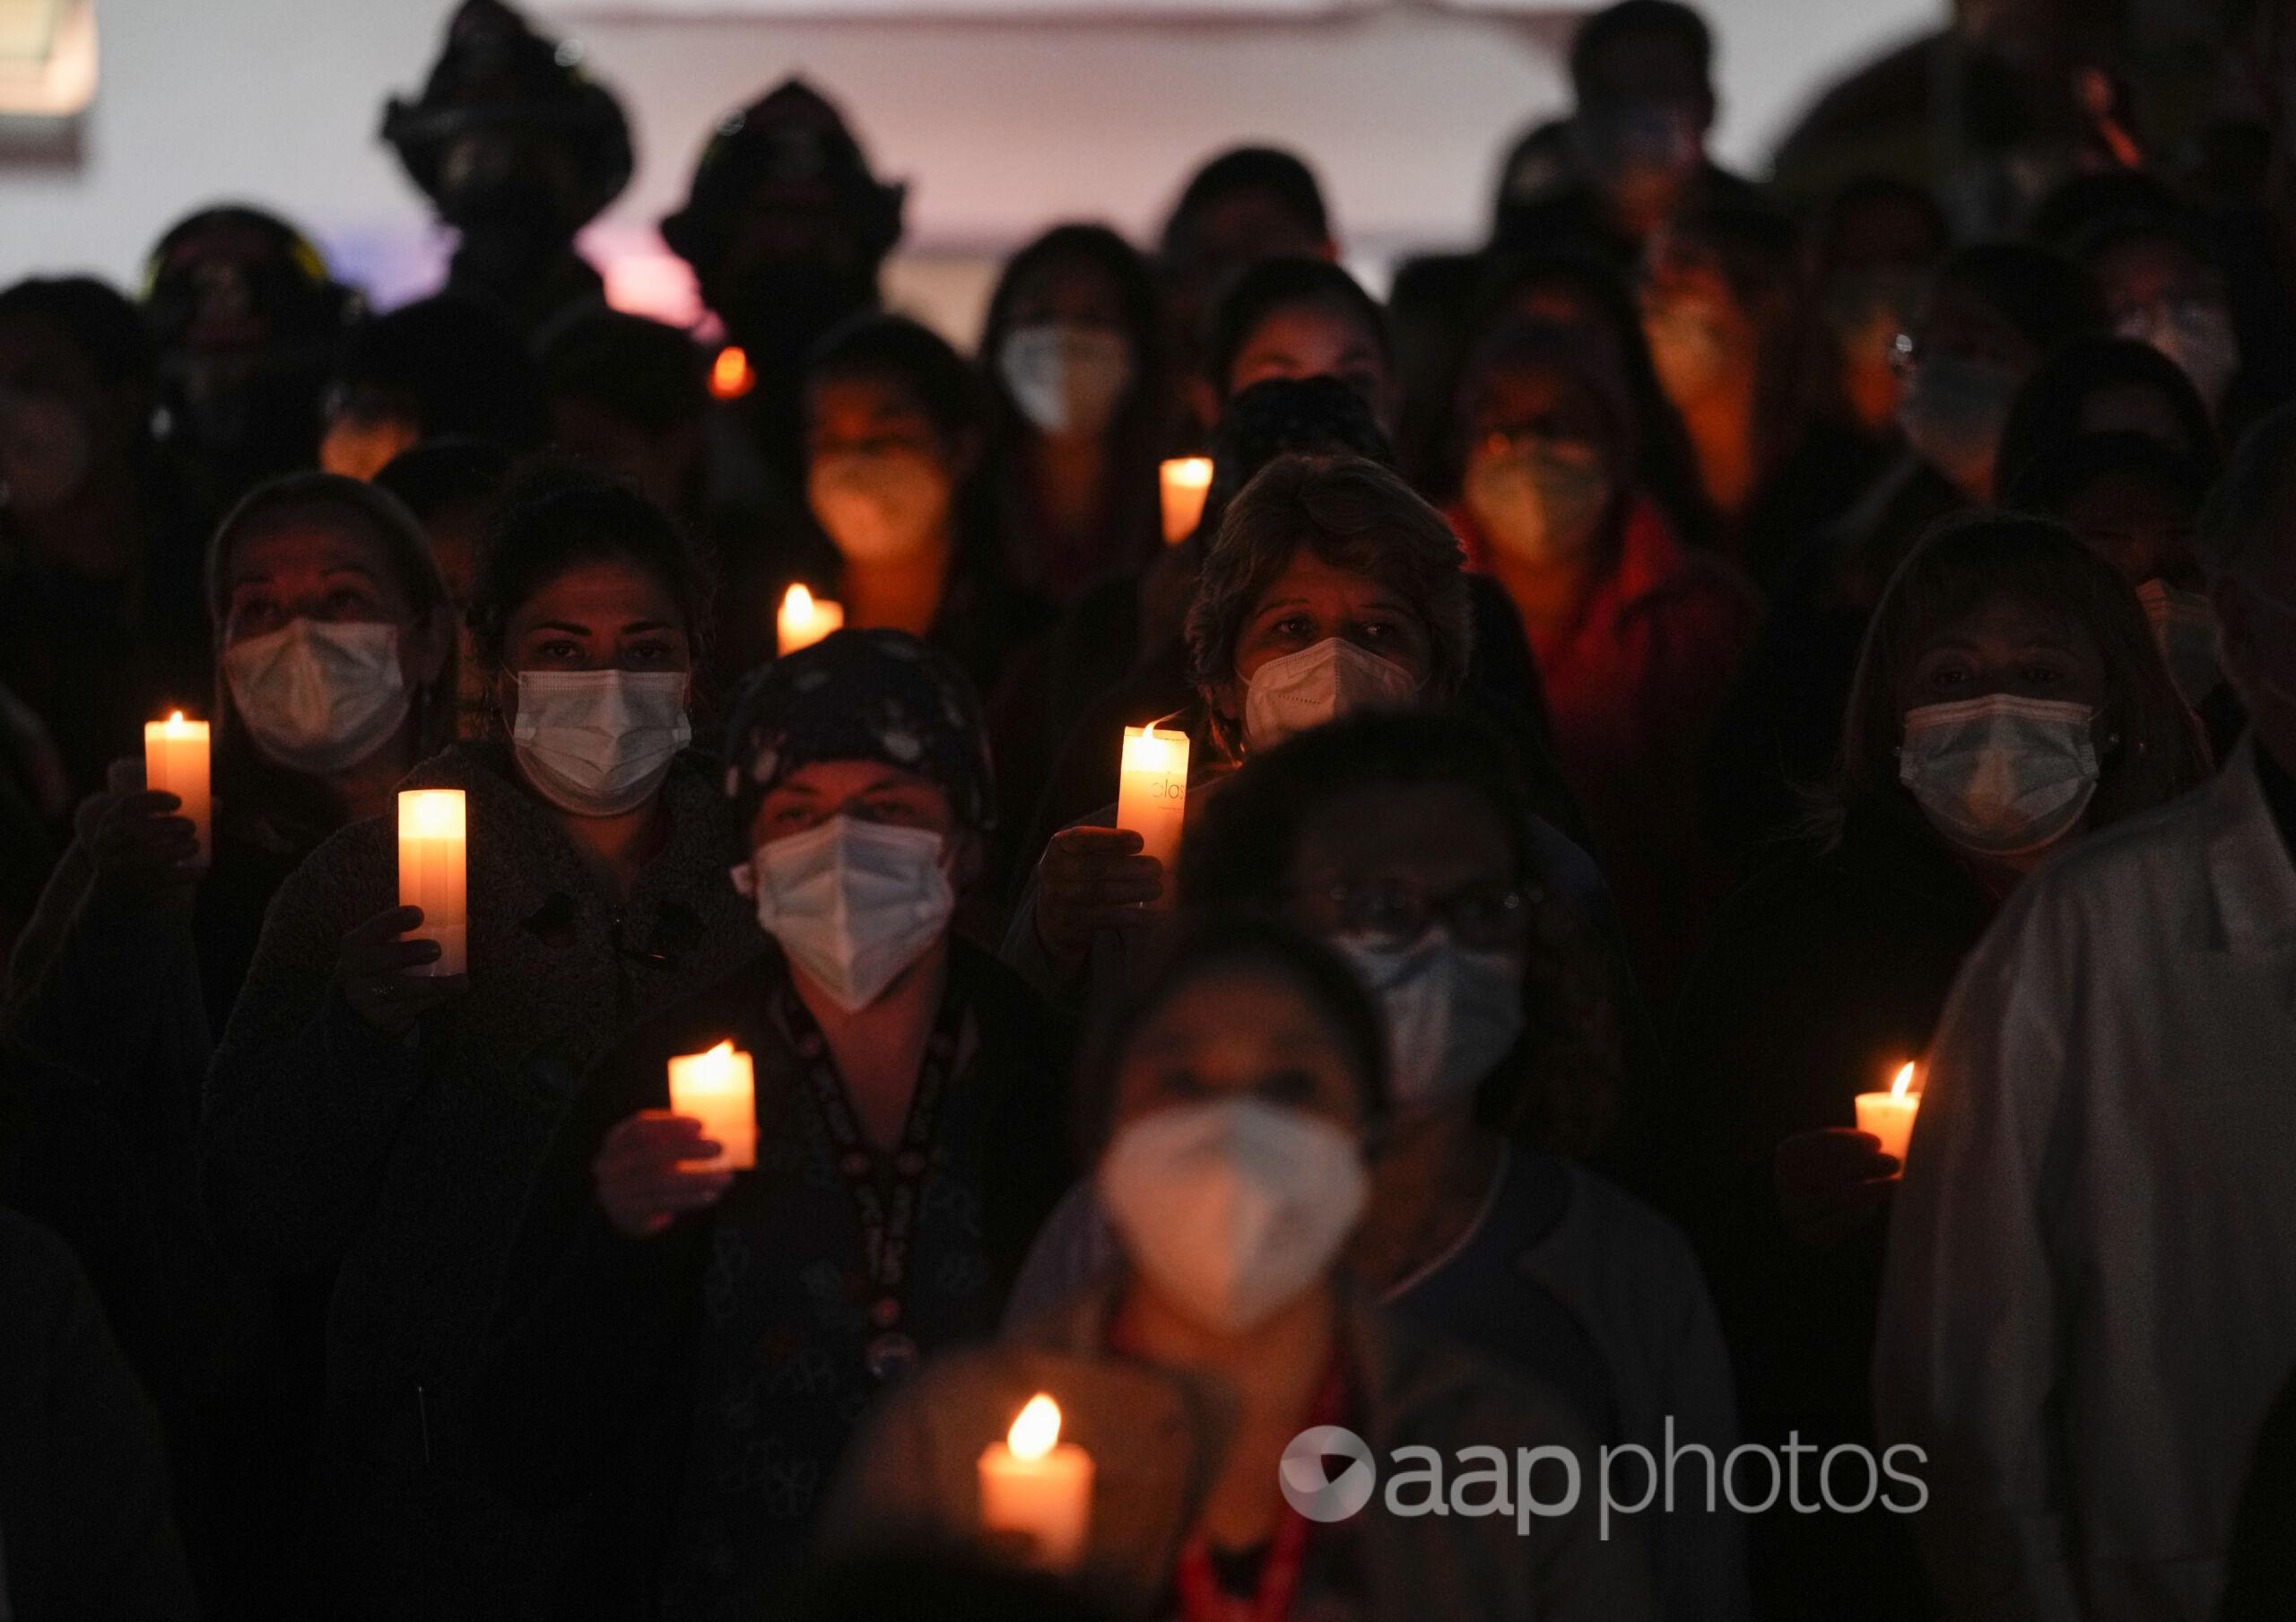 A vigil for COVID-19 victims held in Santiago, Chile.